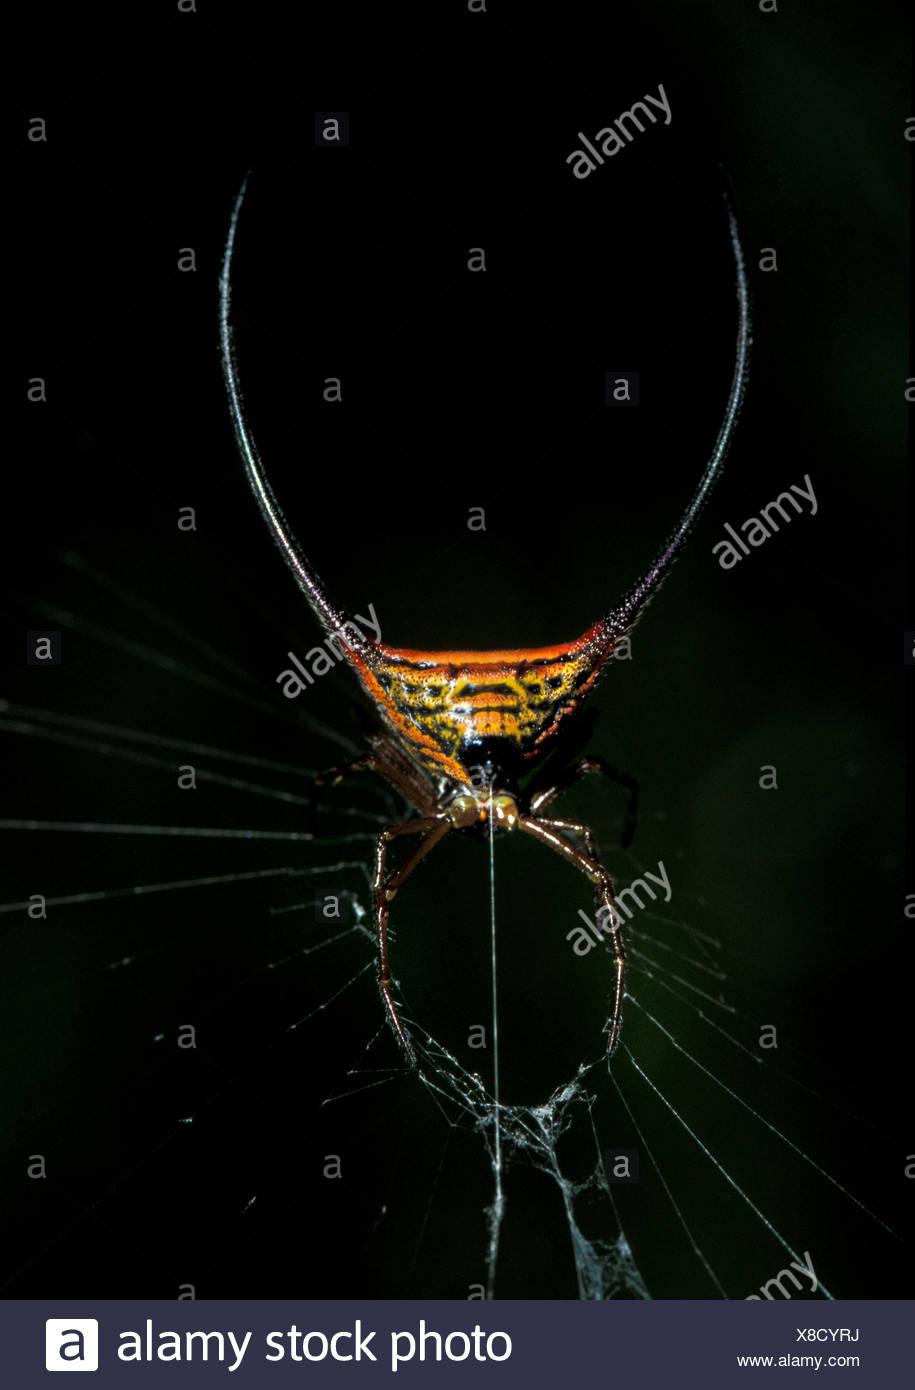 Curved Spiny Spider, Gasteracantha arcuata, Sukau River area, Sabah, Borneo, on web at night - Stock Image